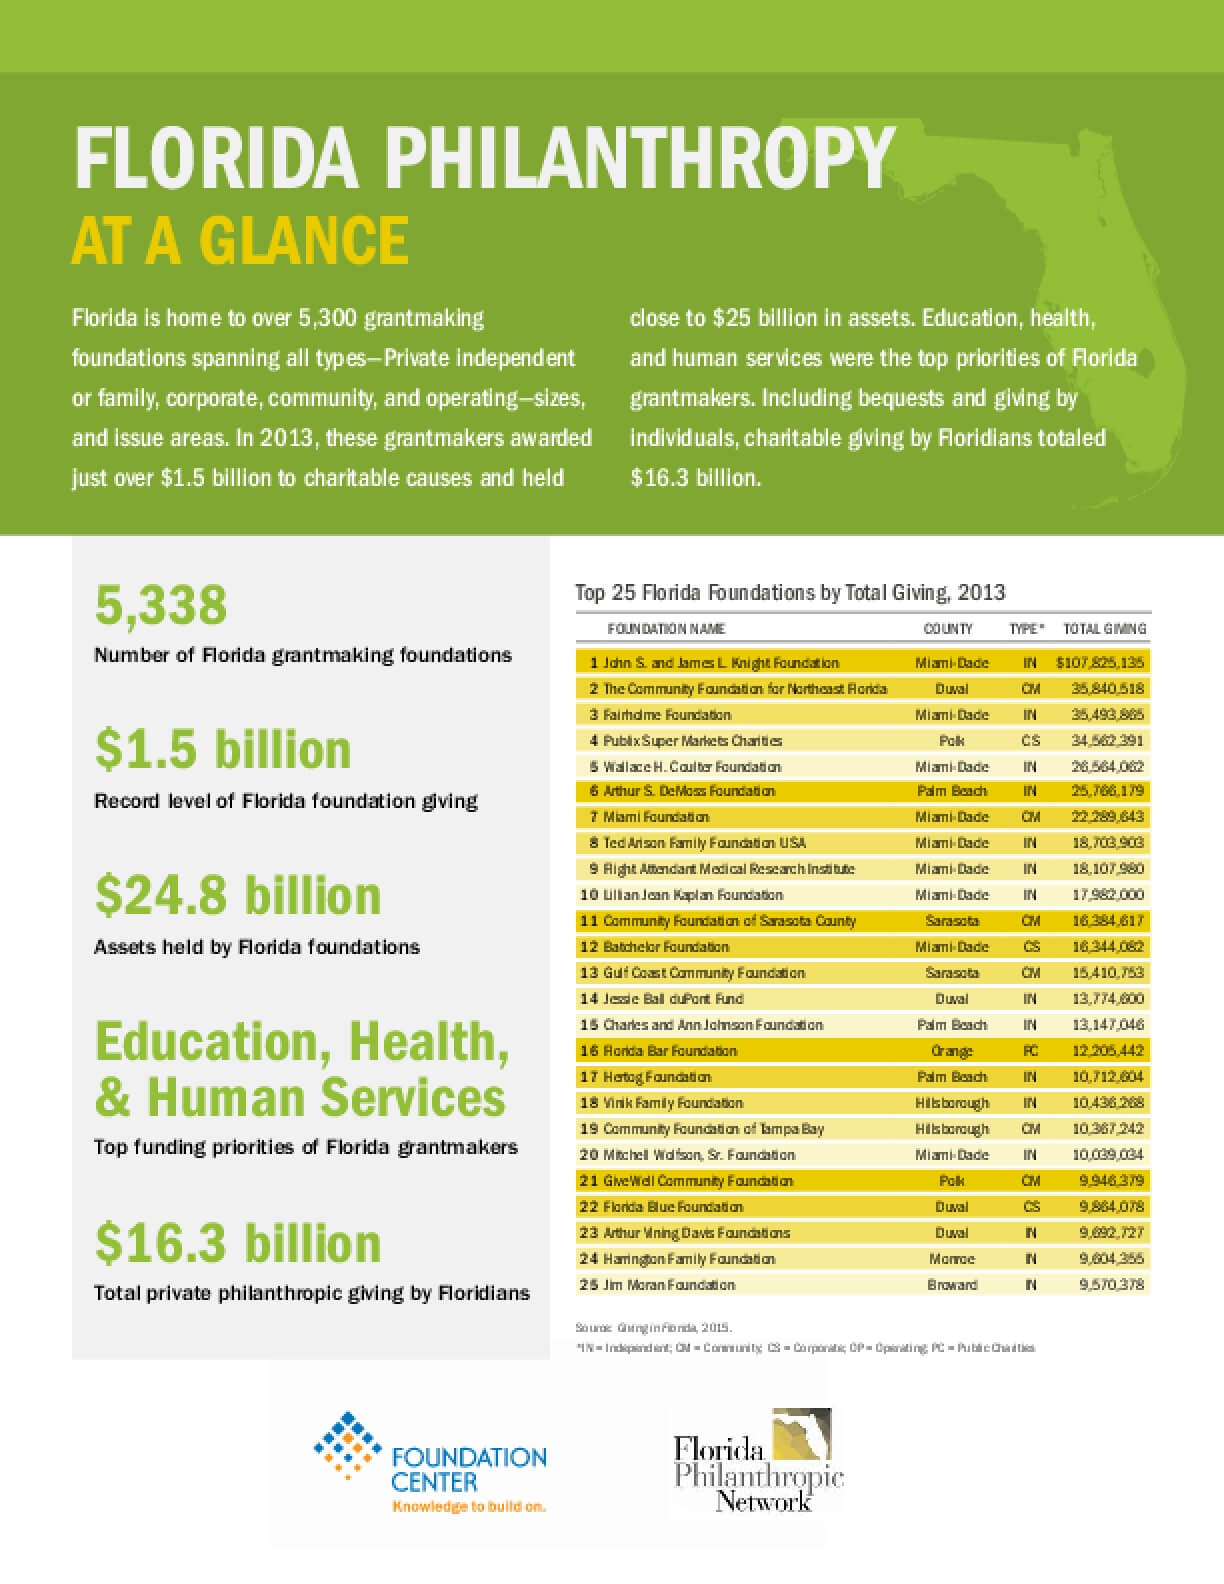 Florida Philanthropy at a Glance